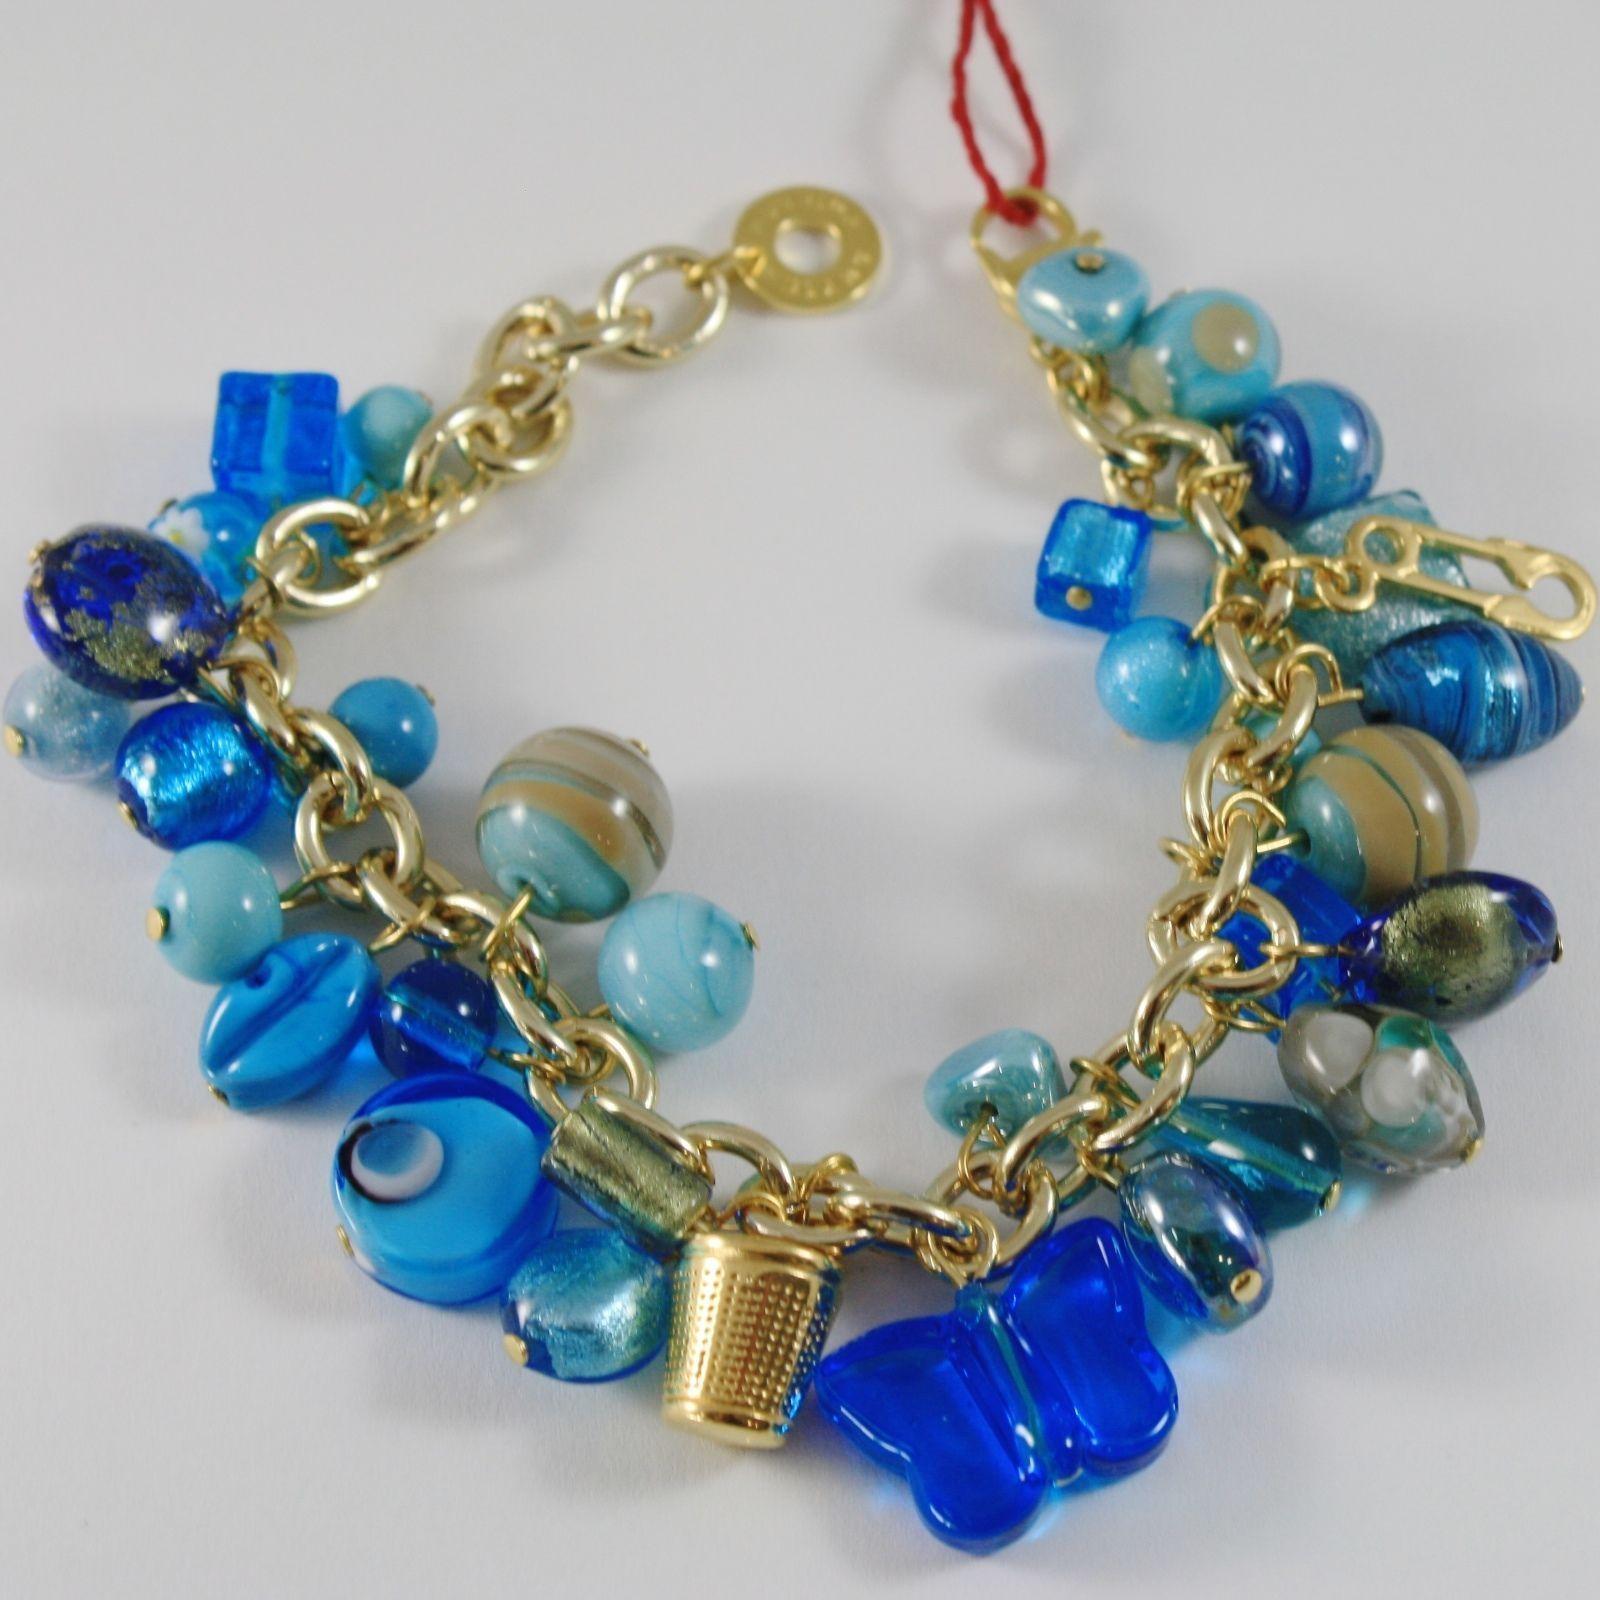 BRACELET ANTICA MURRINA VENEZIA WITH MURANO GLASS WITH CHARMS BLUE BR291A07